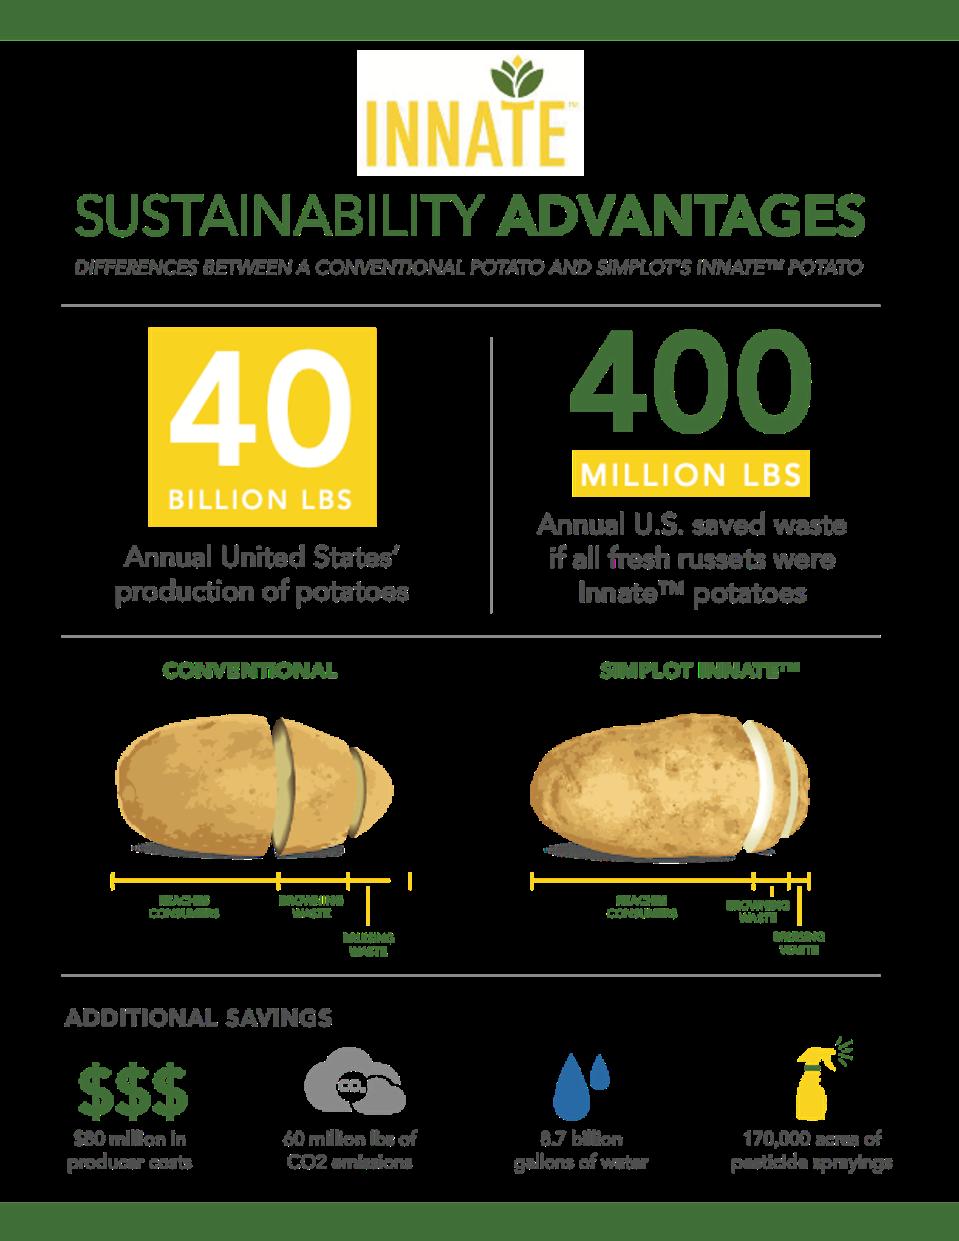 food waste savings etc